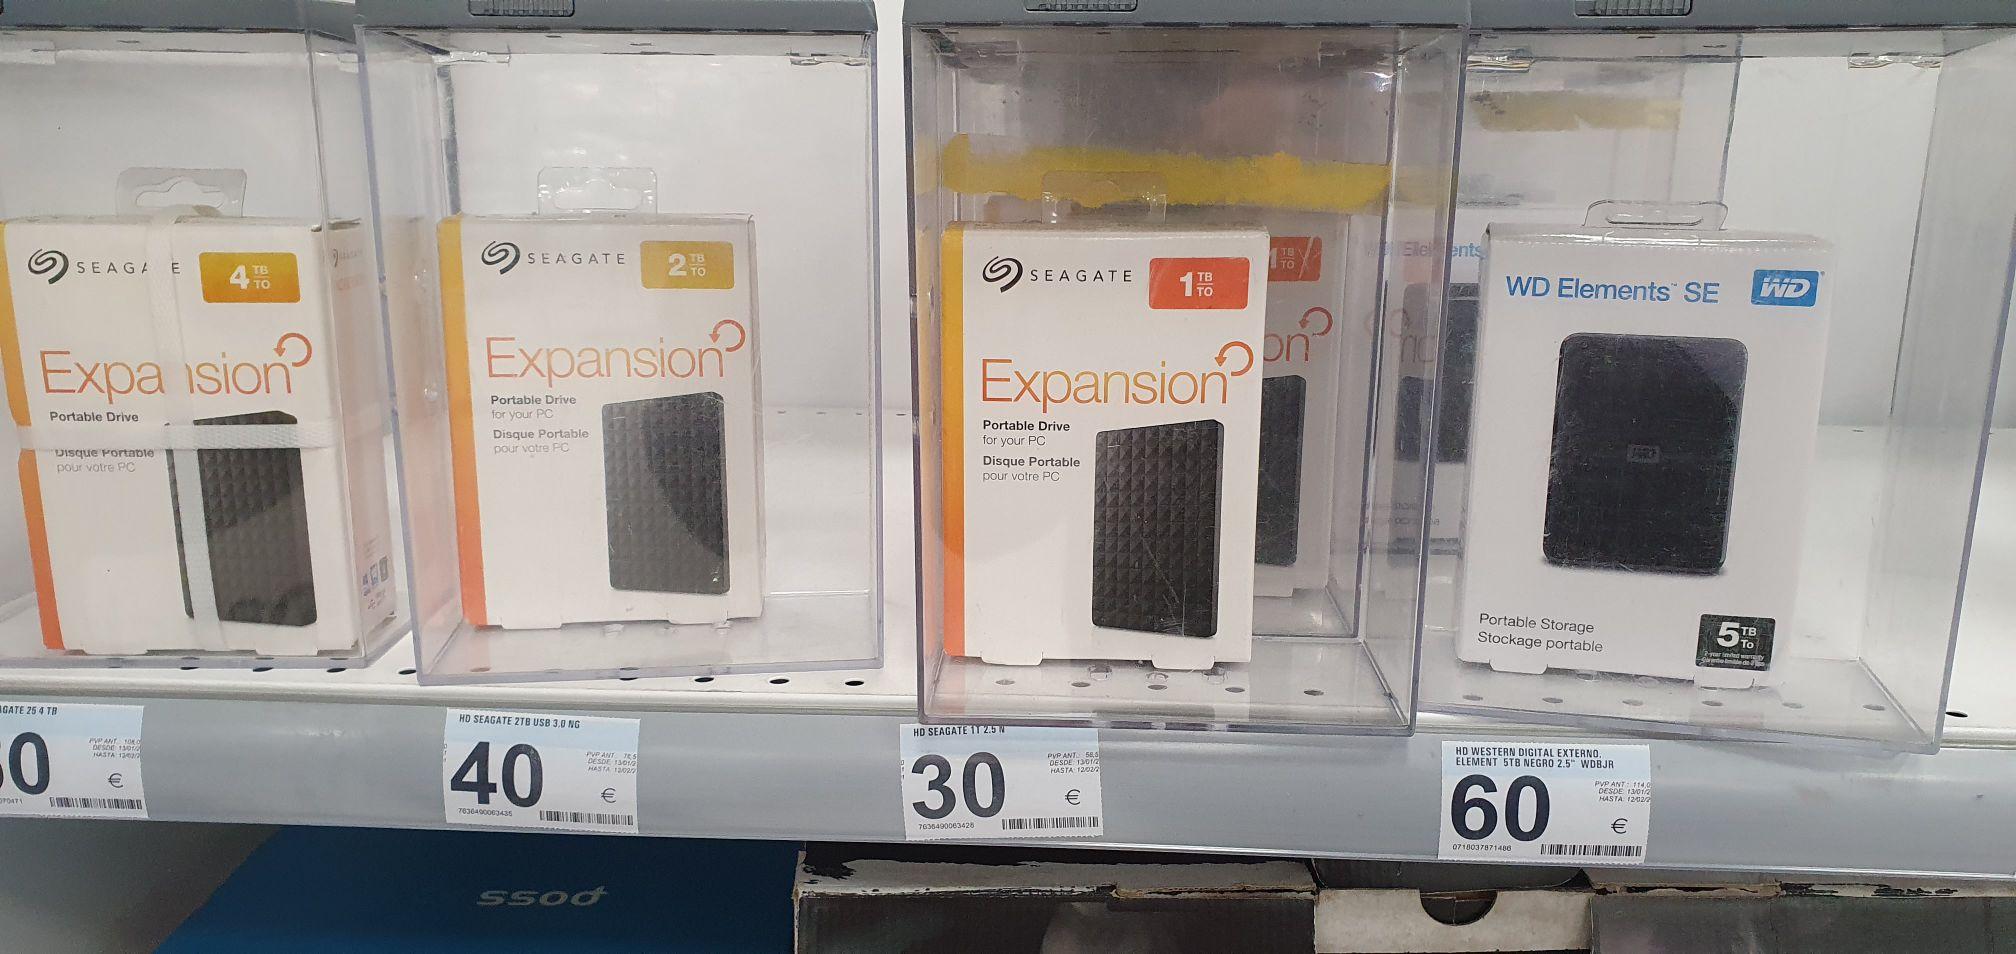 Discos duros 1TB 30€, 2TB 40€, 5TB 60€ en Carrefour Mallorca